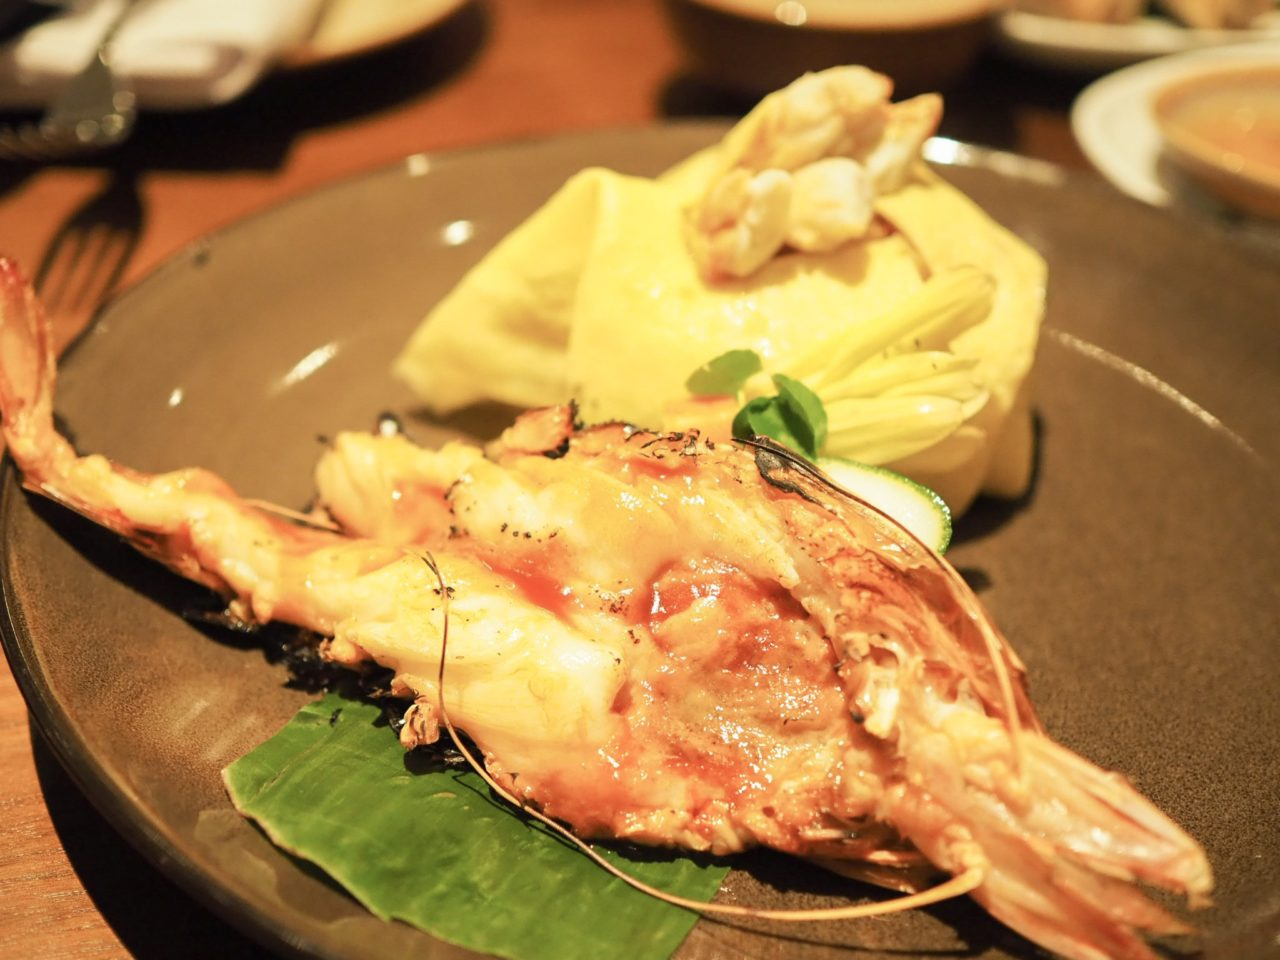 img 2964 1 - URBAN Cafe - スコータイ上海で味わう本場タイの味!期間限定メニューのご紹介